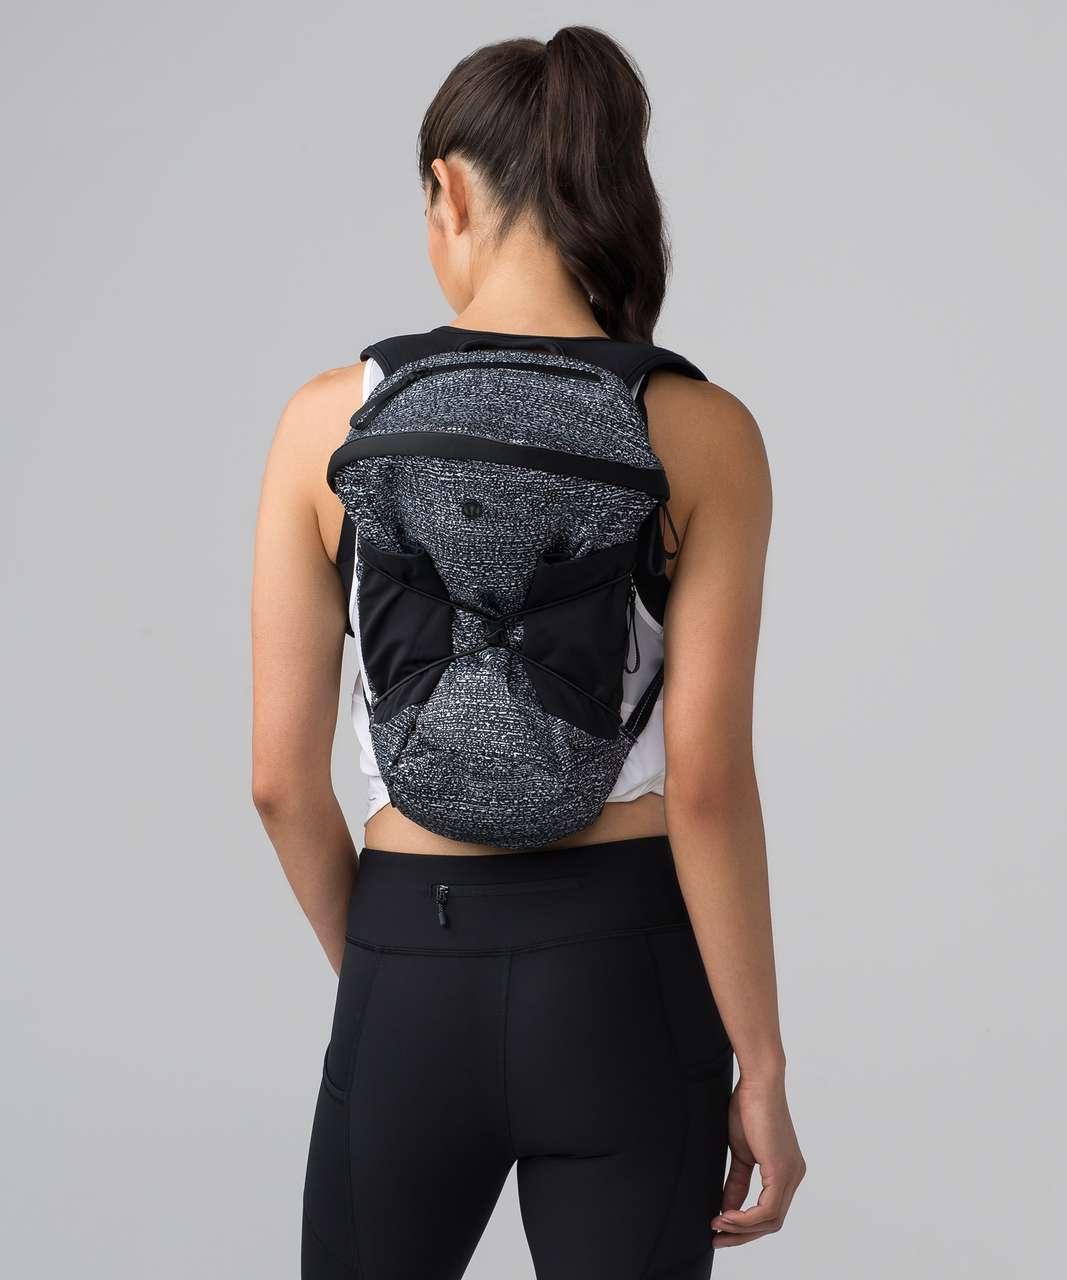 Lululemon Run All Day Backpack II *13L - Maxi Salt Alpine White Black